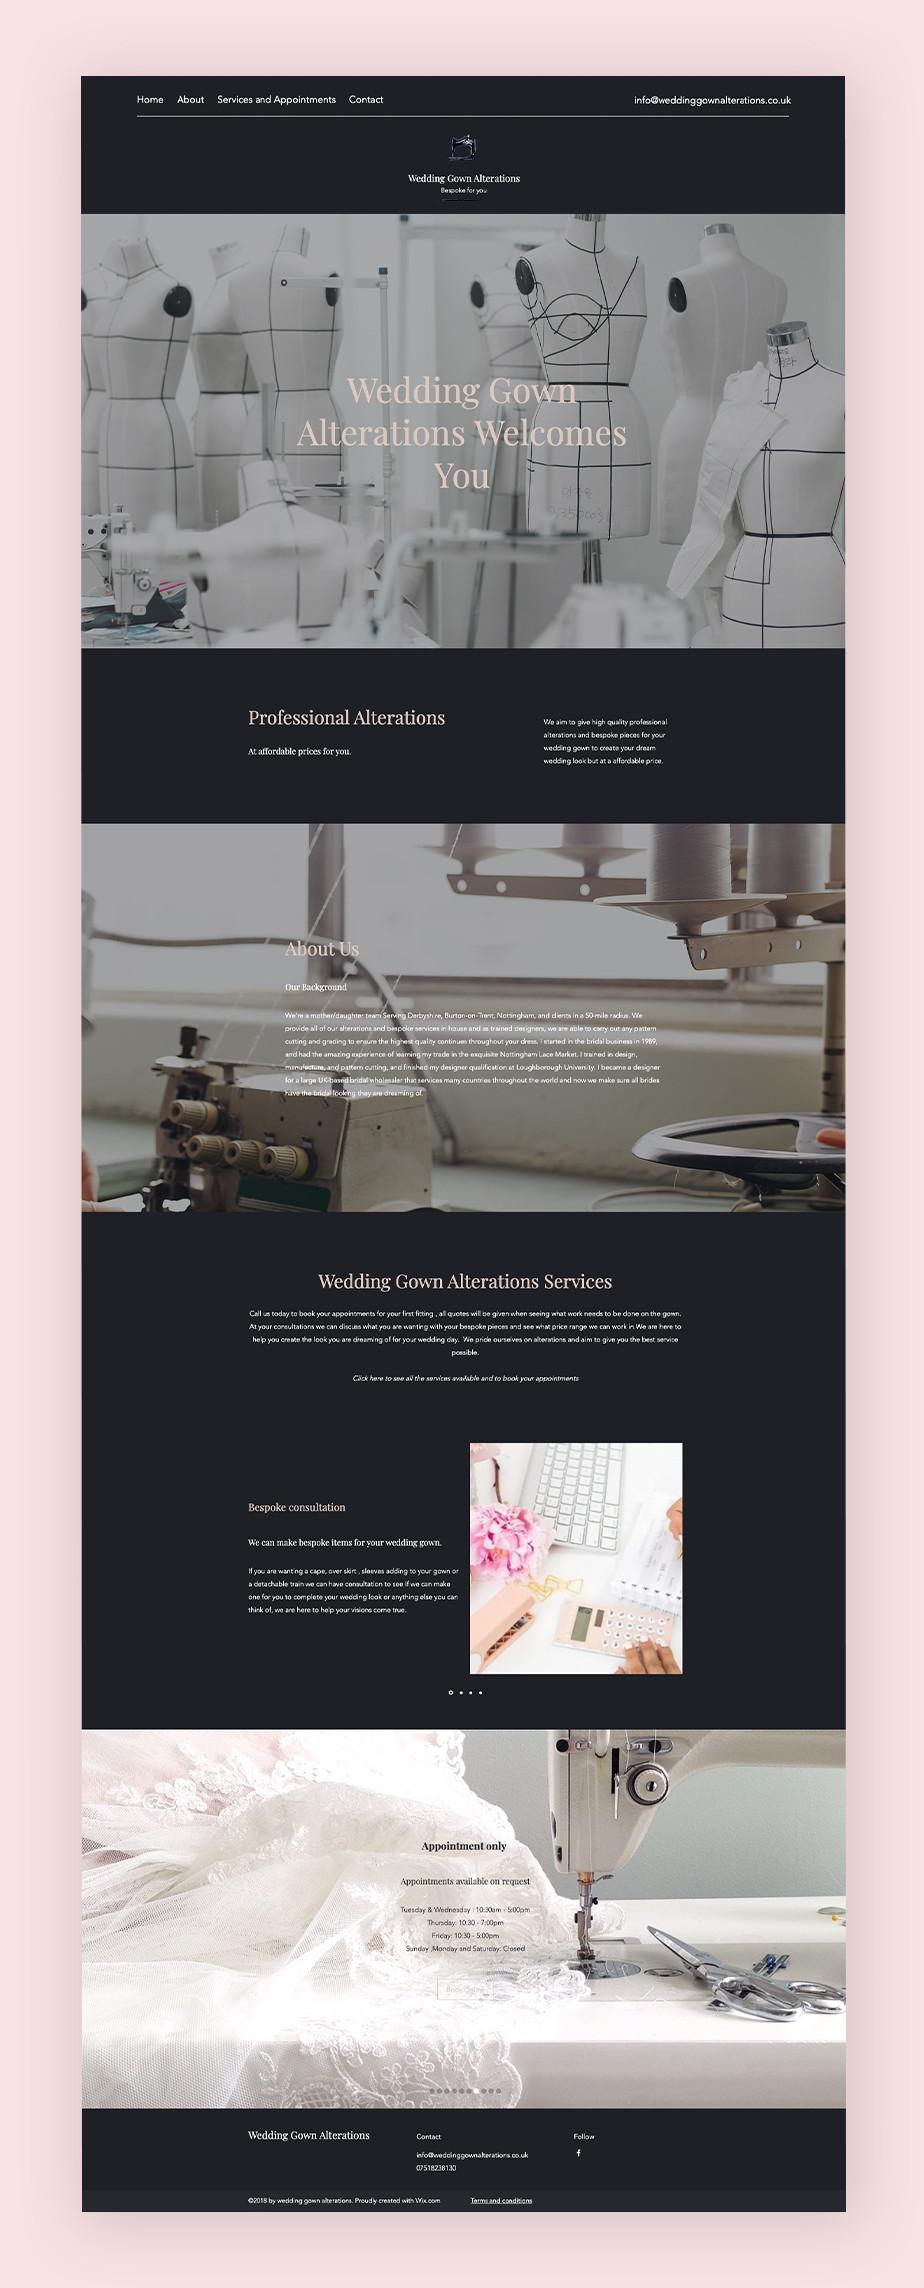 Wedding Gown Alterationsのオンライン予約サイト